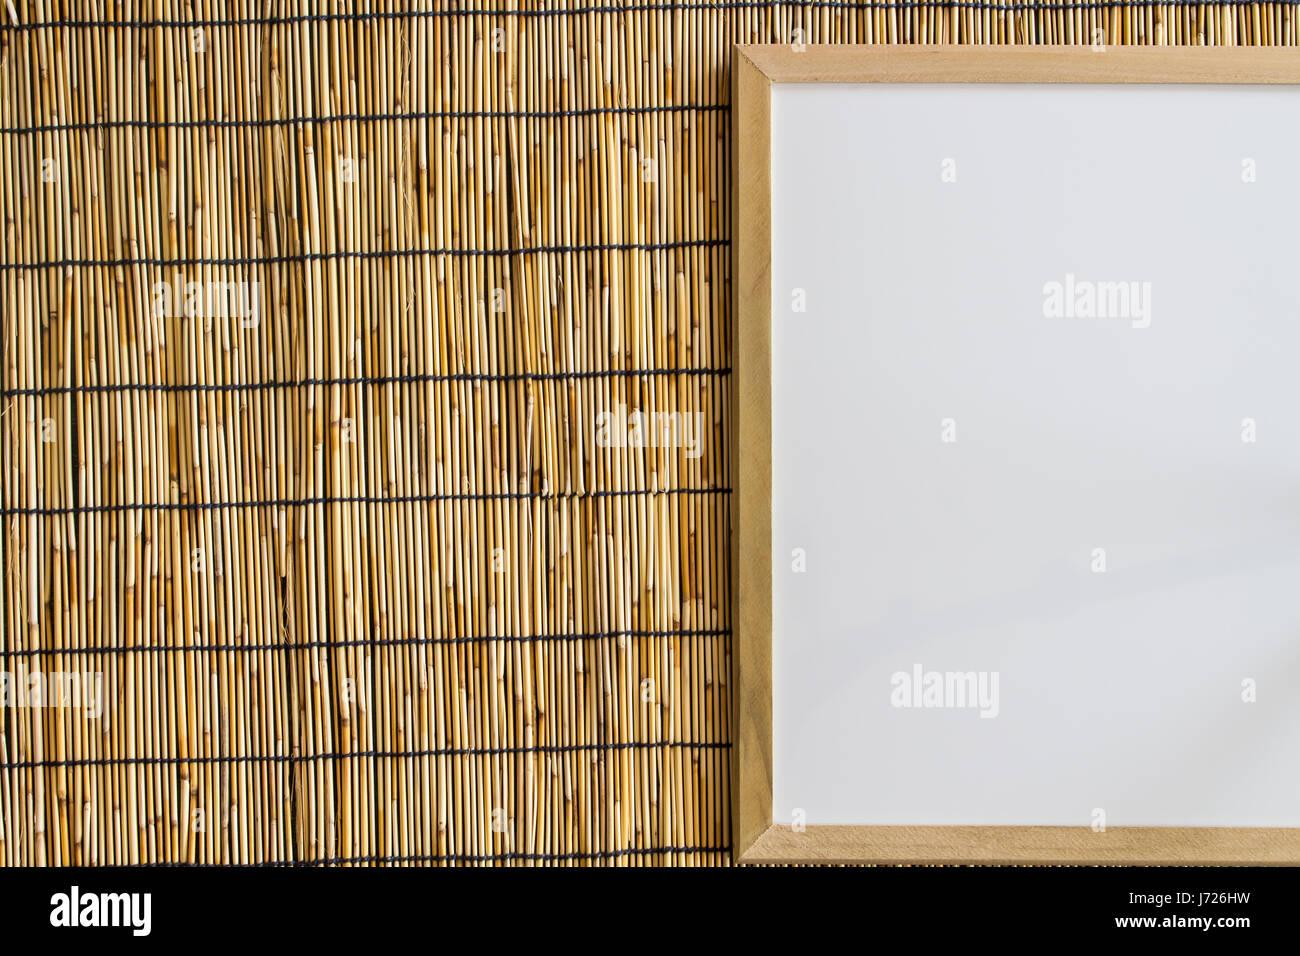 Bamboo Blind Stock Photos  for Bamboo Curtains Kerala  555kxo